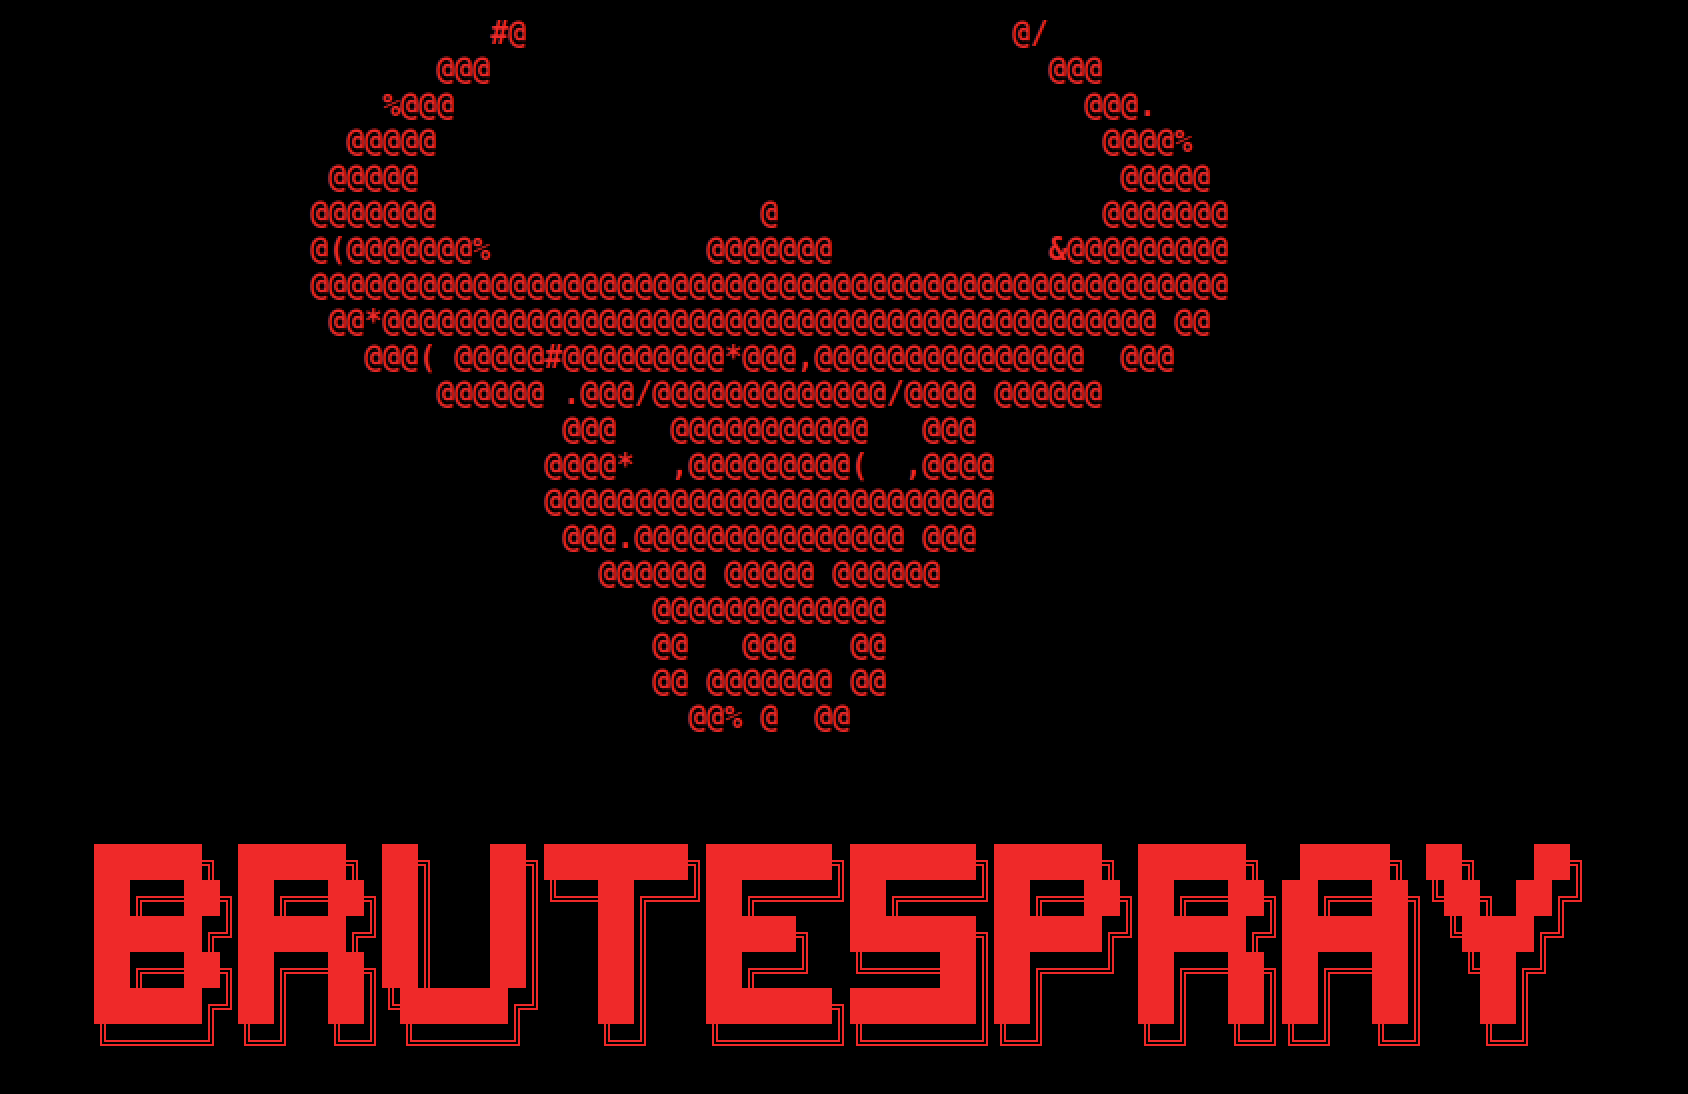 GitHub - x90skysn3k/brutespray: Brute-Forcing from Nmap